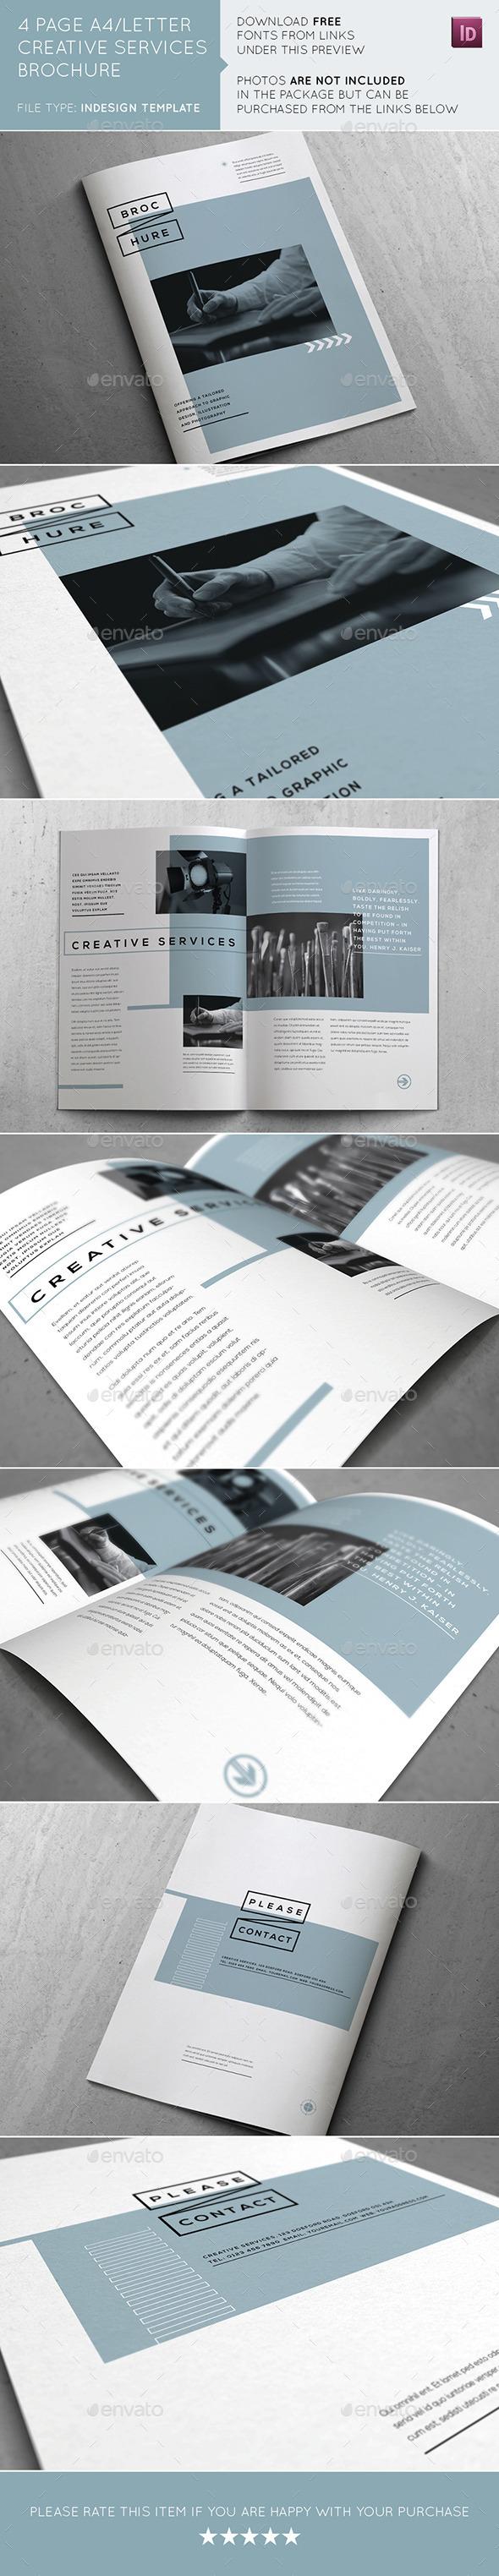 GraphicRiver Creative Services Brochure 11082511